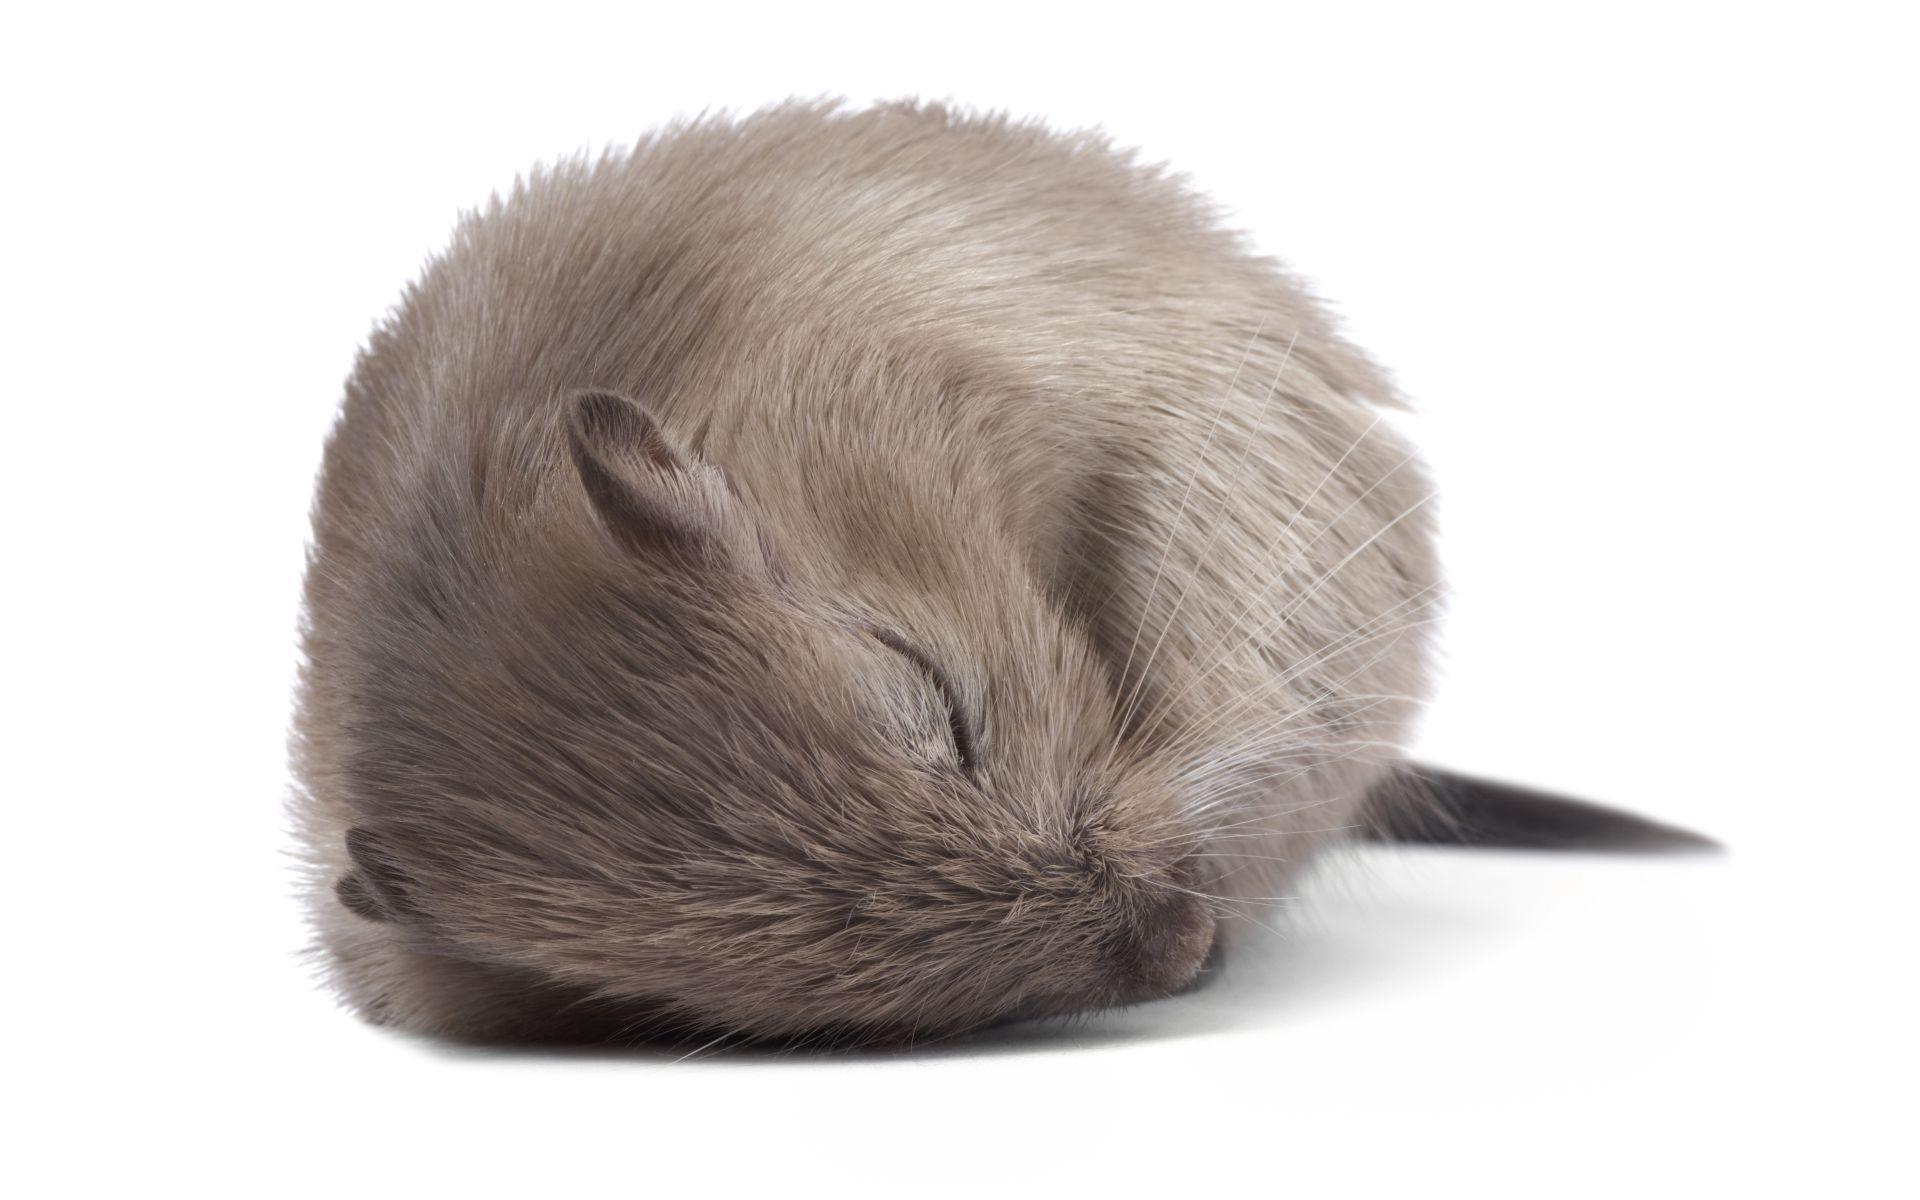 Сон спасает нейроны от перегрузки